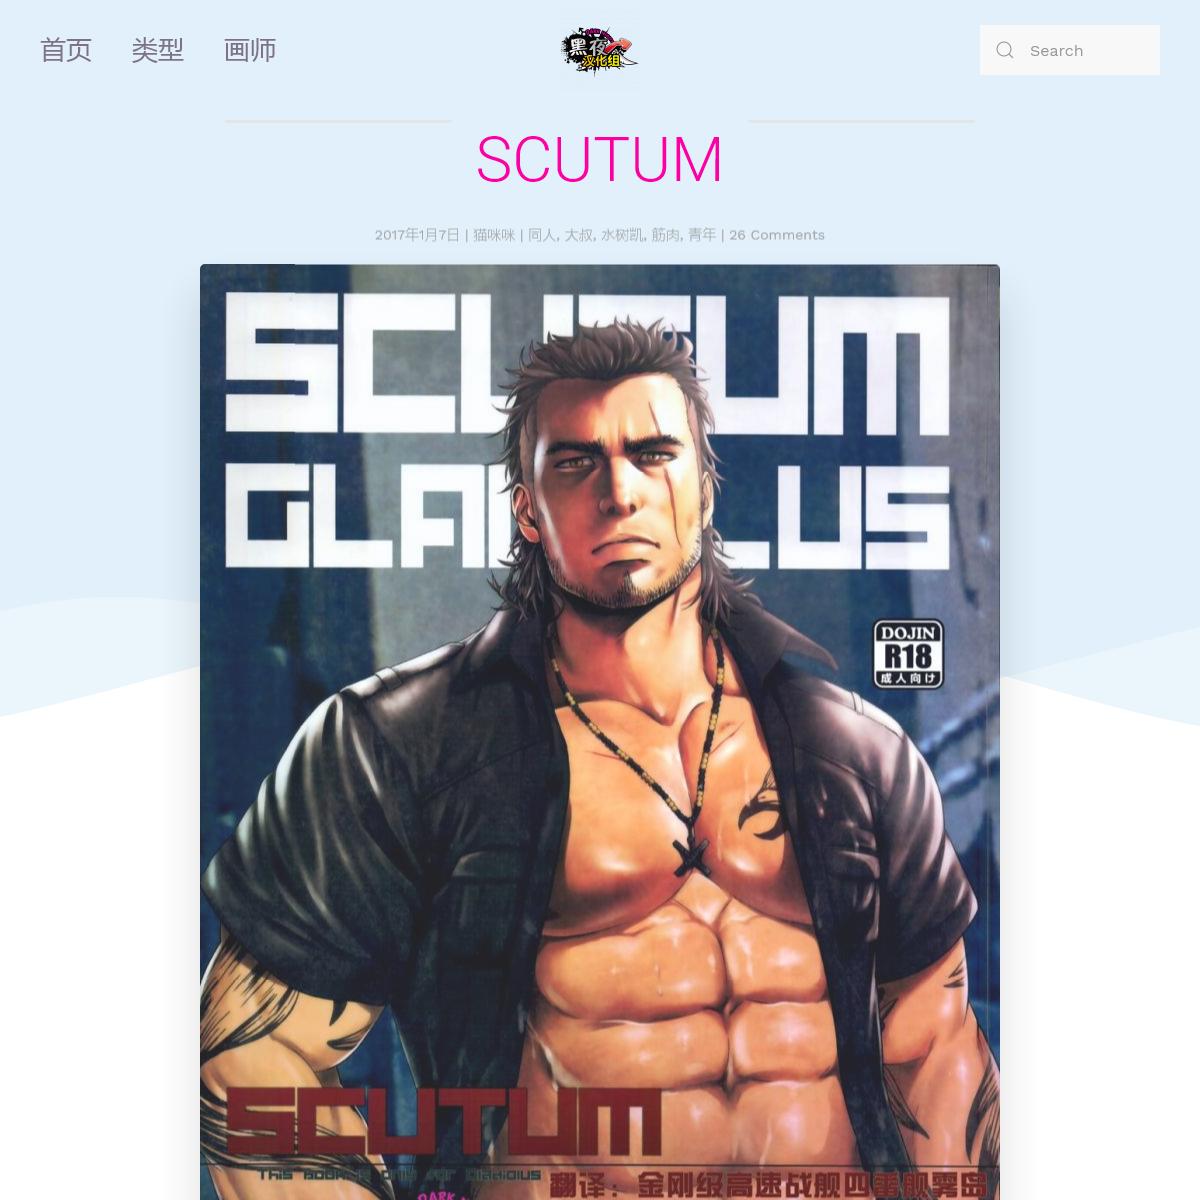 SCUTUM - 黑夜汉化组